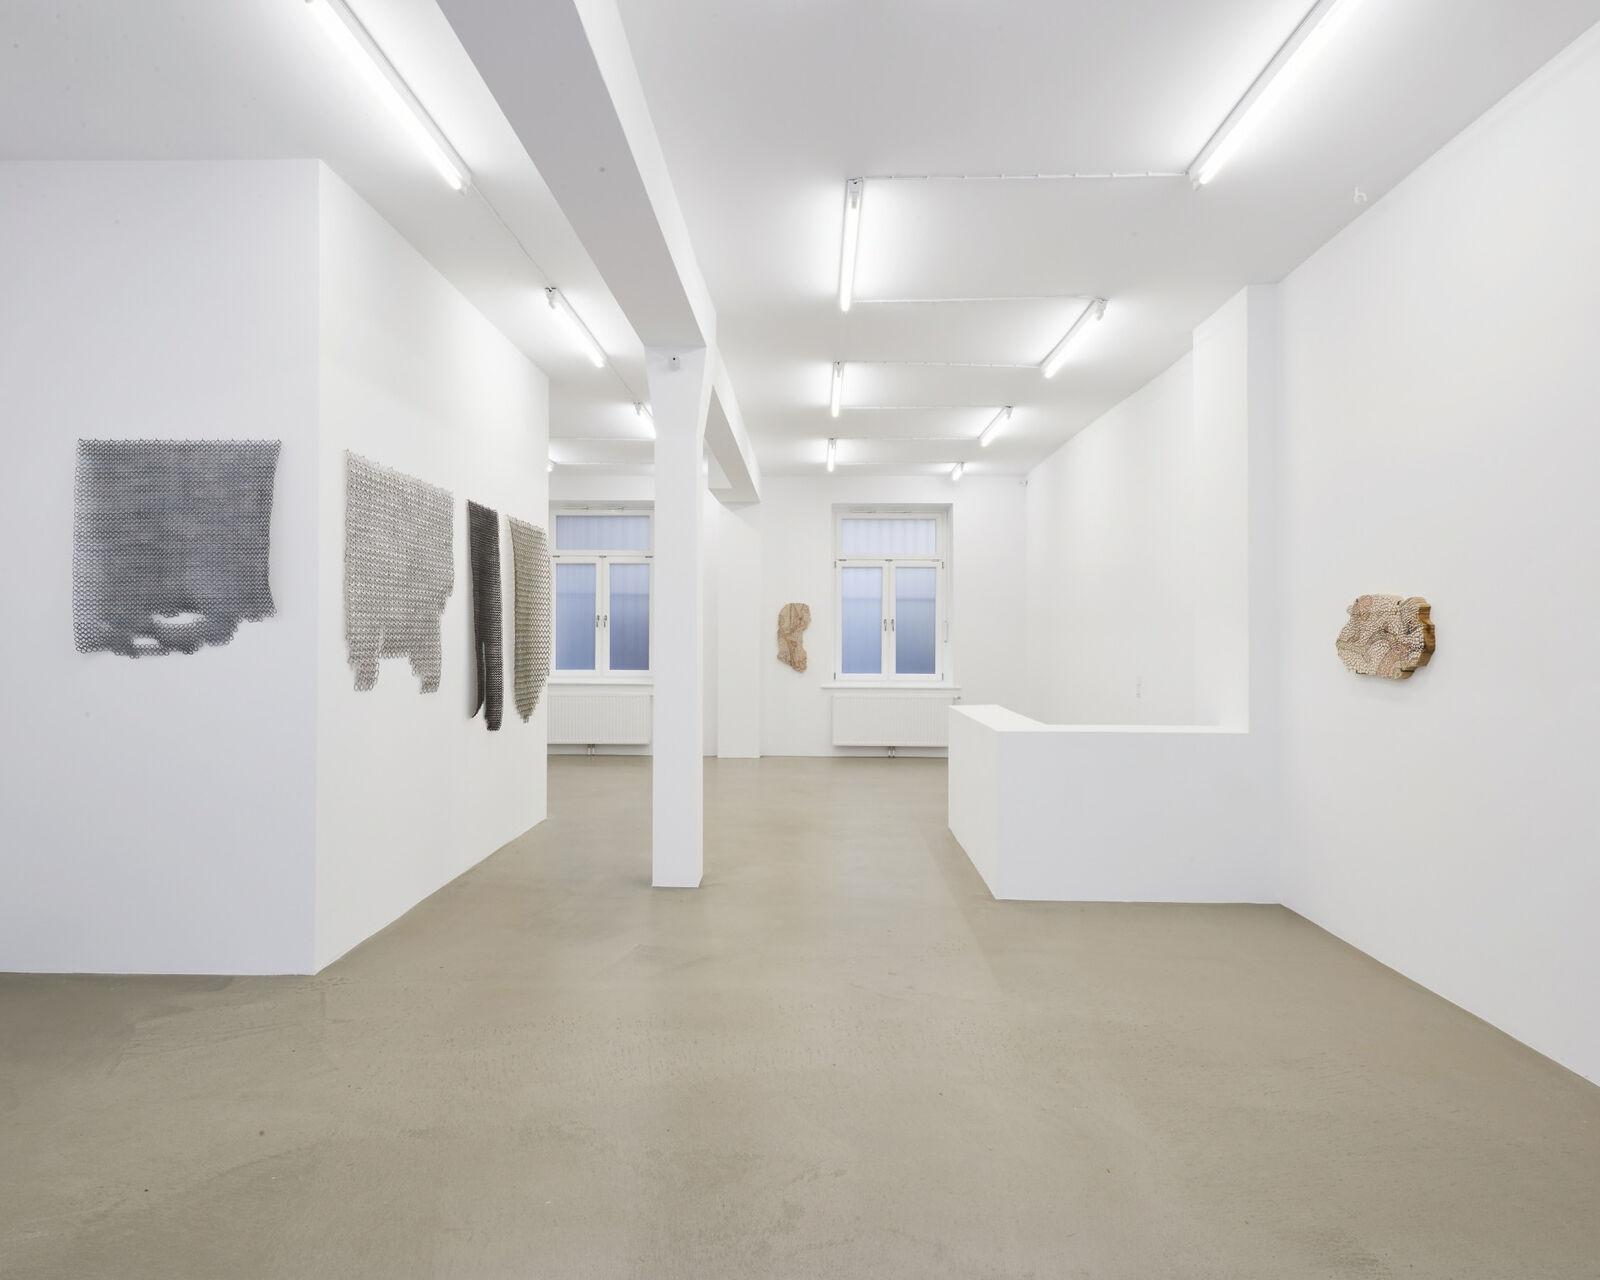 Gerrit Frohne-Brinkmann & Emanuel Mauthe, Fragments of Friendship